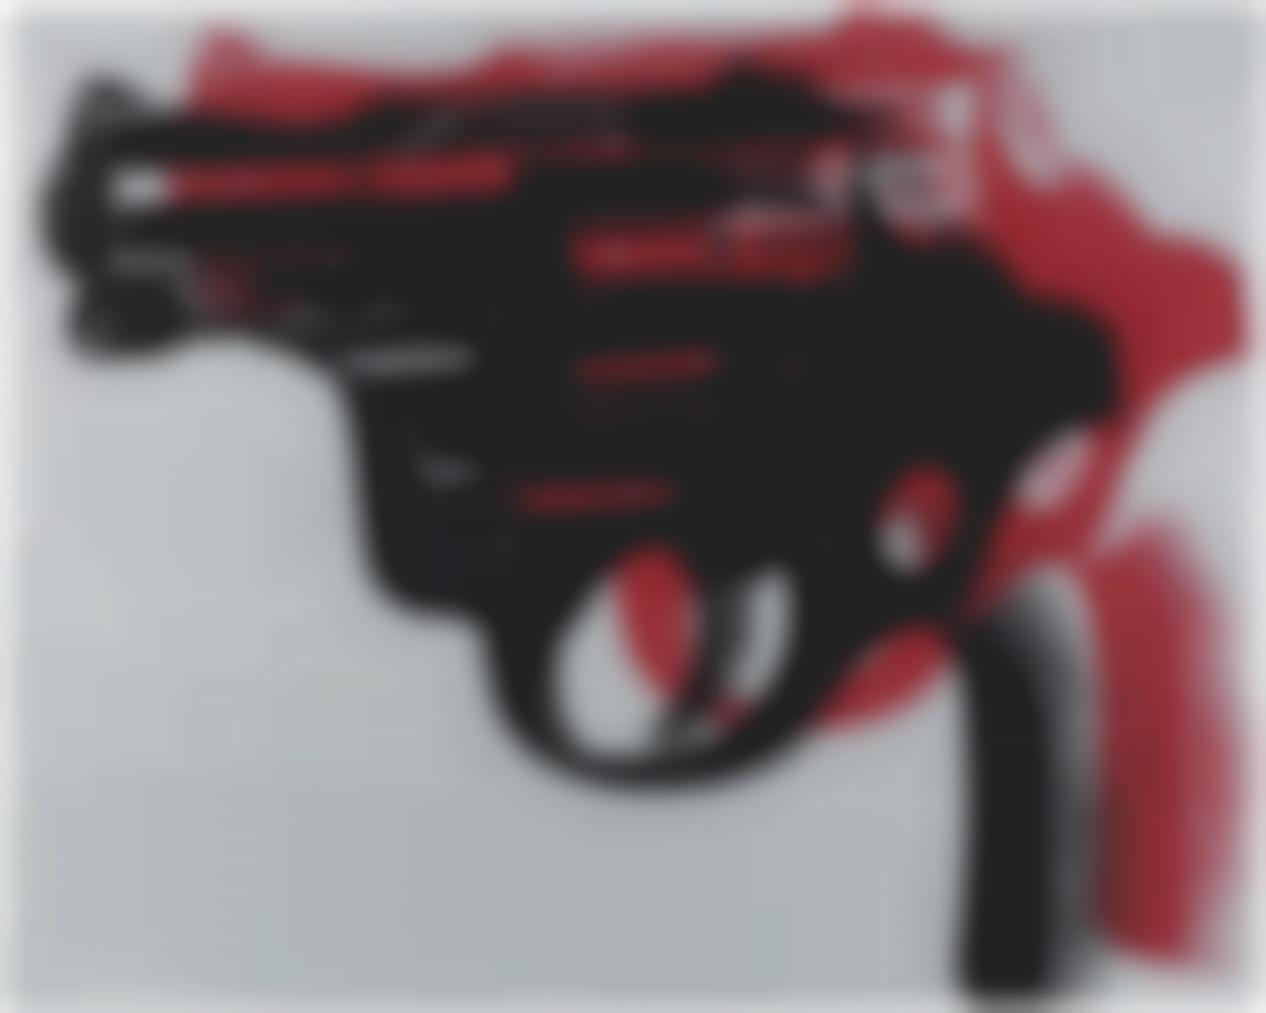 Andy Warhol-Gun-1982